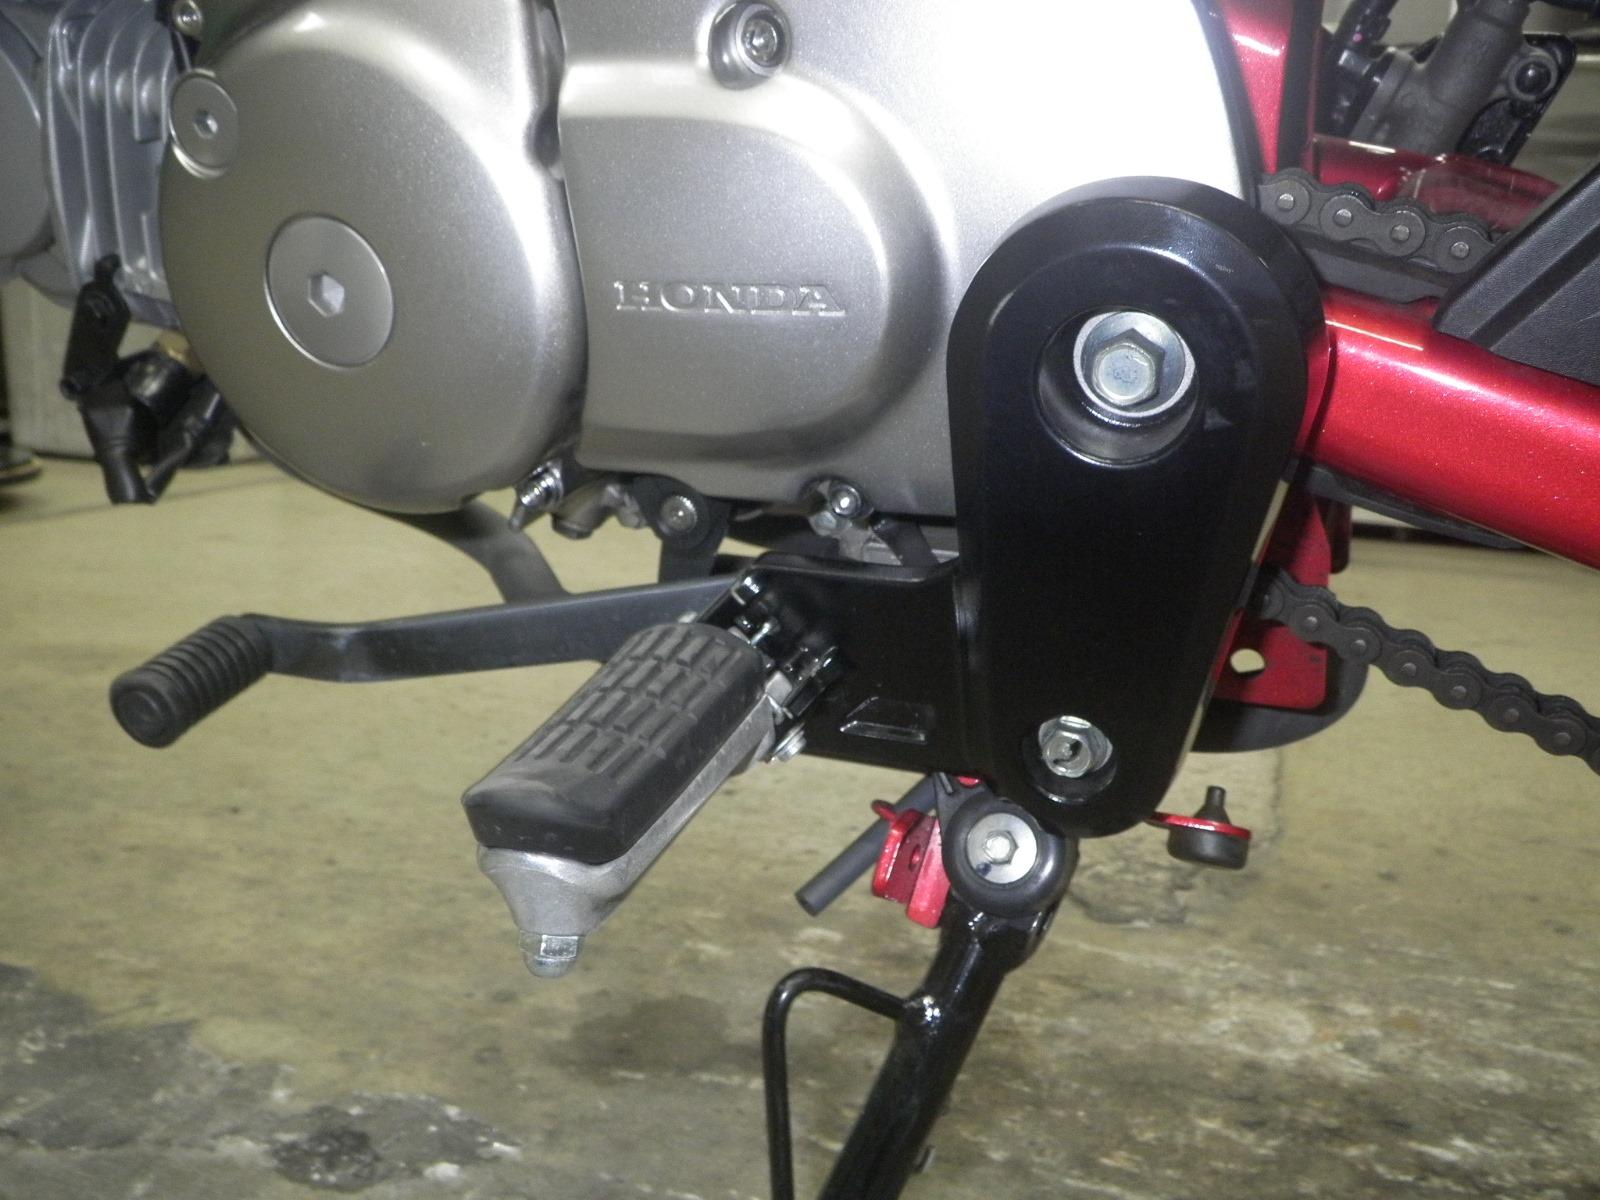 HONDA Monkey 125 二手車 2018年 - 「Webike摩托車市」